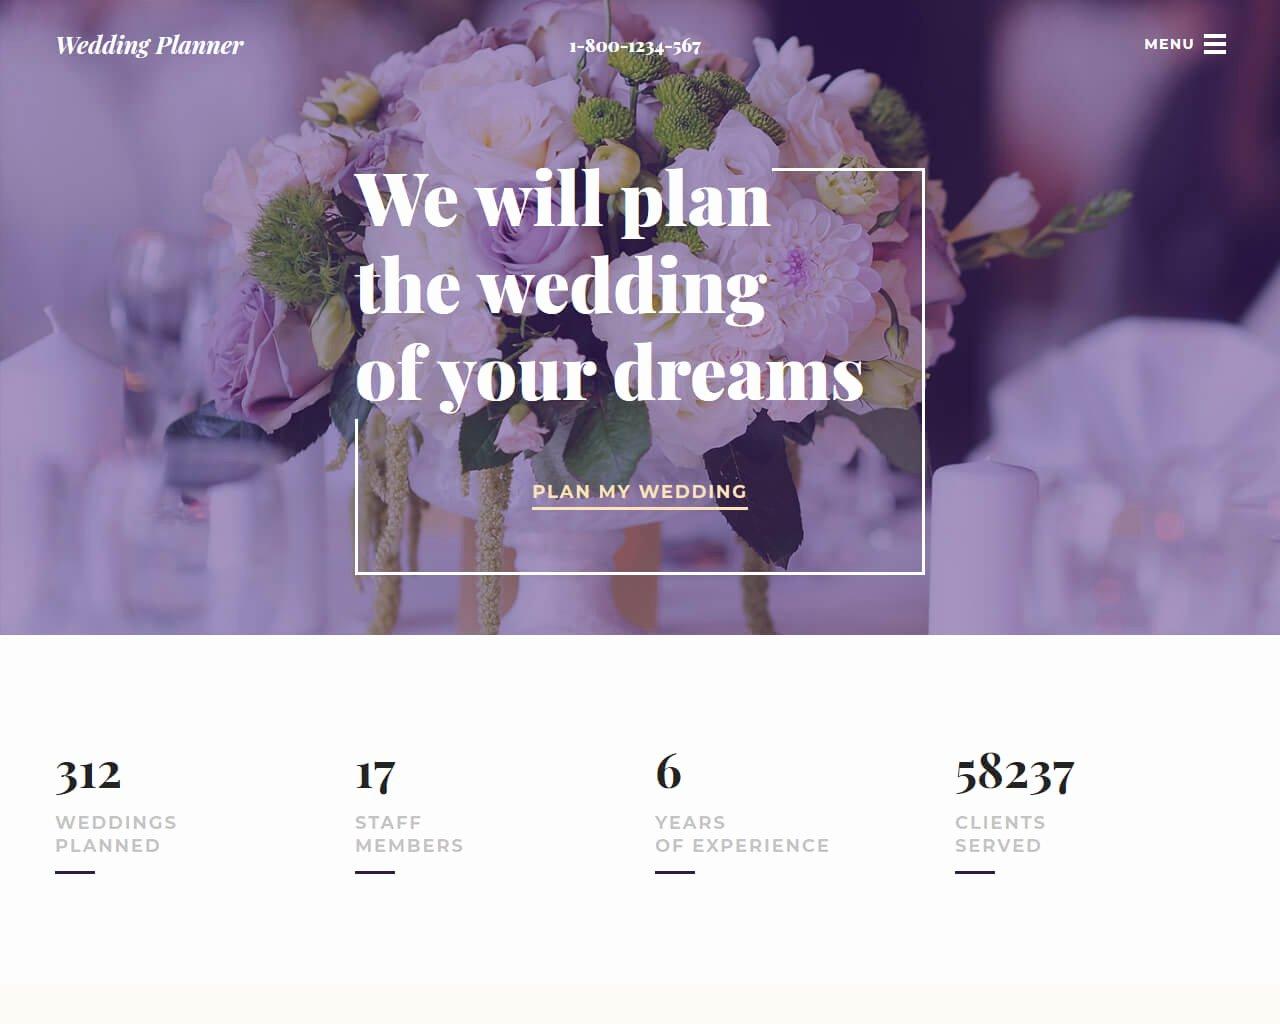 Wedding Planner Website Template Fresh 20 Best Wedding Website Templates for Your Special Day 2018 Templatemag